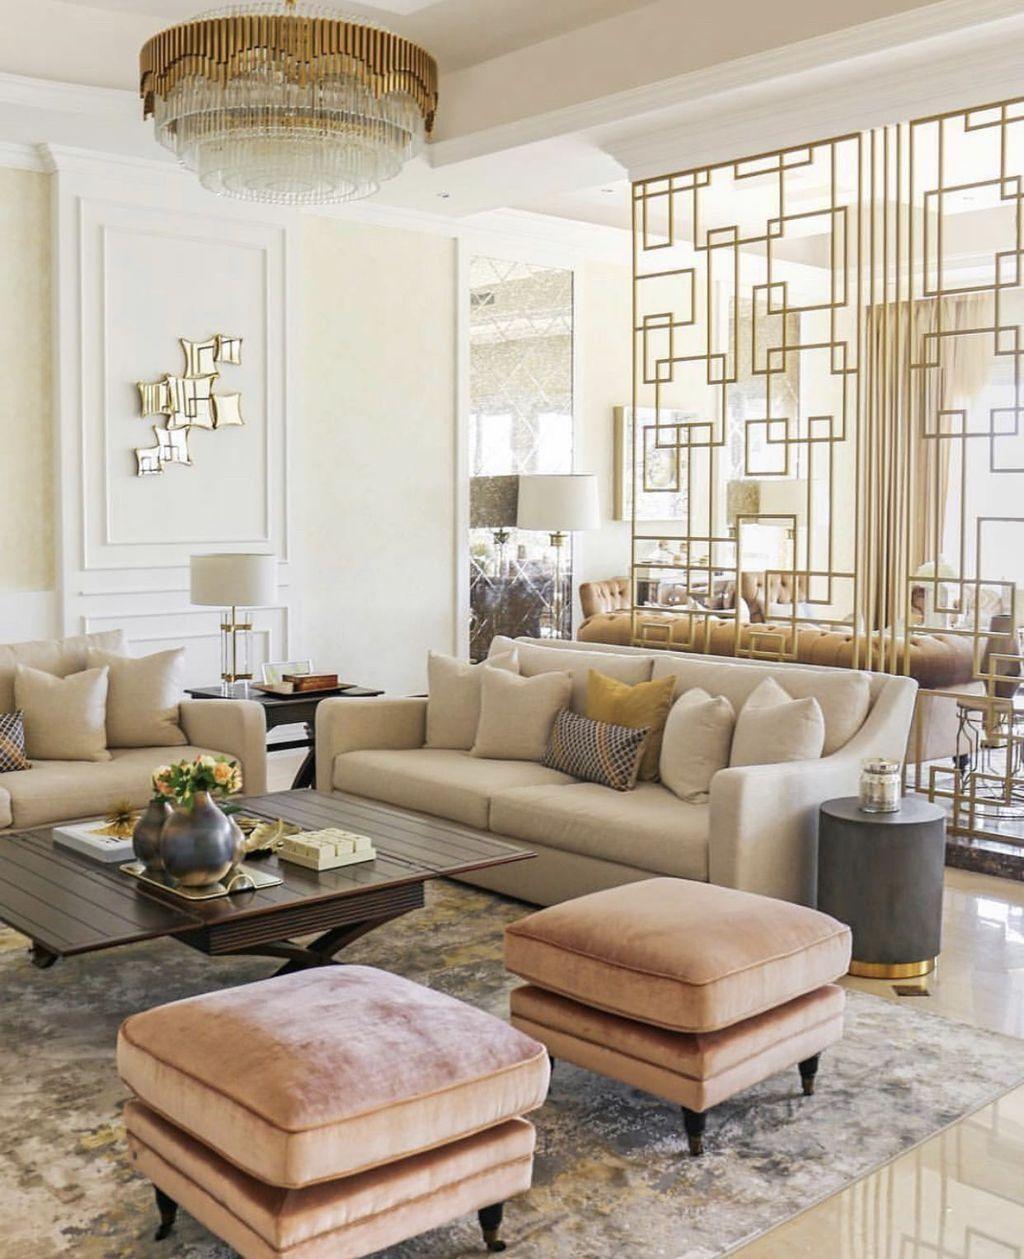 48 Luxurious Modern Living Room Decor Ideas Son Zamlar In 2020 Modern Furniture Living Room Contemporary Decor Living Room Elegant Living Room Design